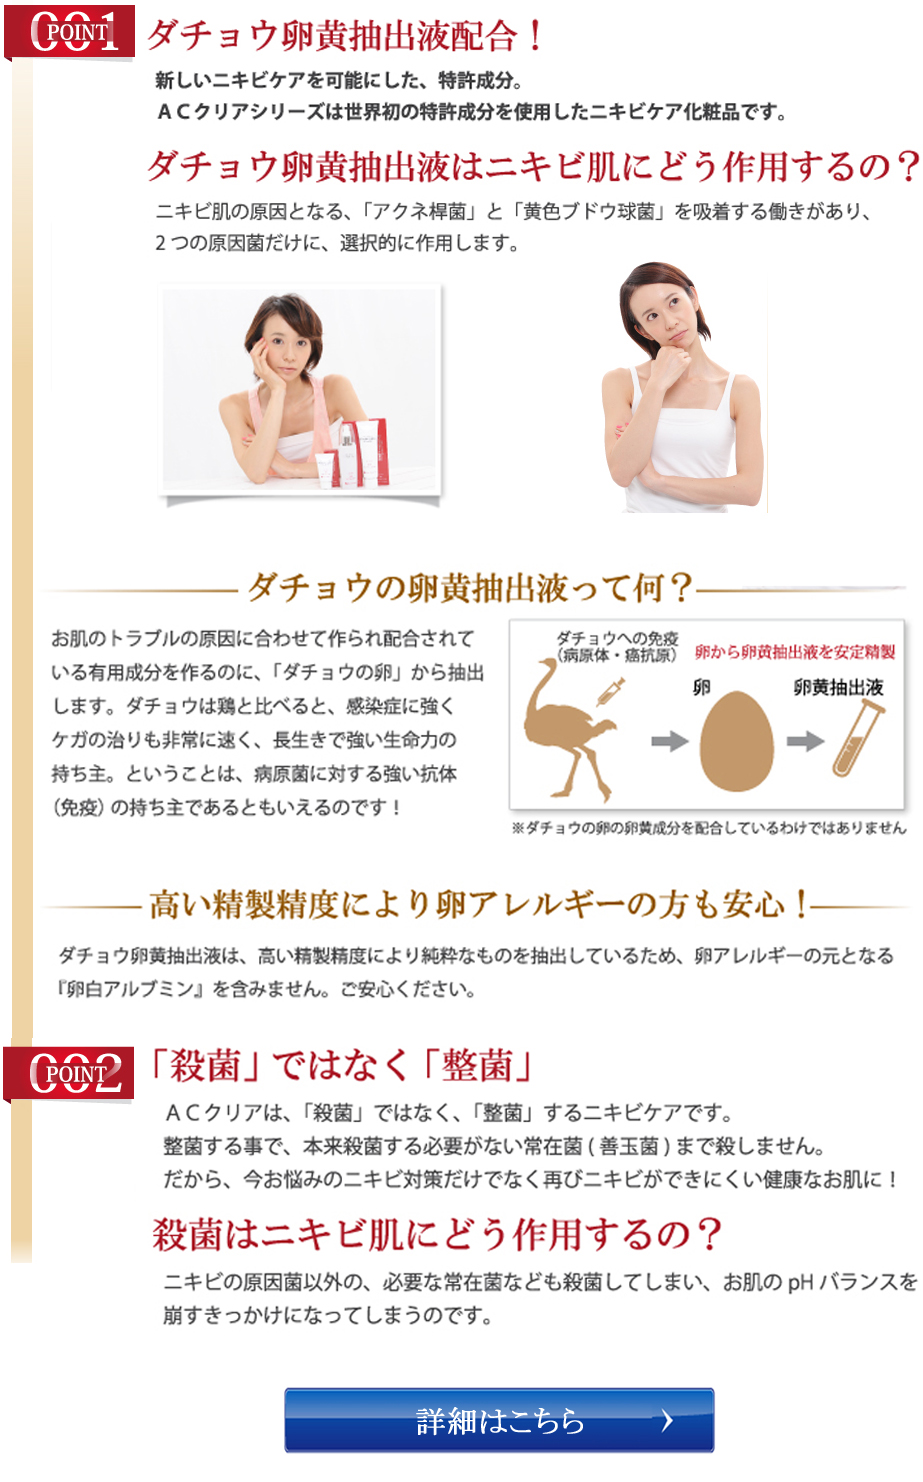 nikibi-2-2.jpg